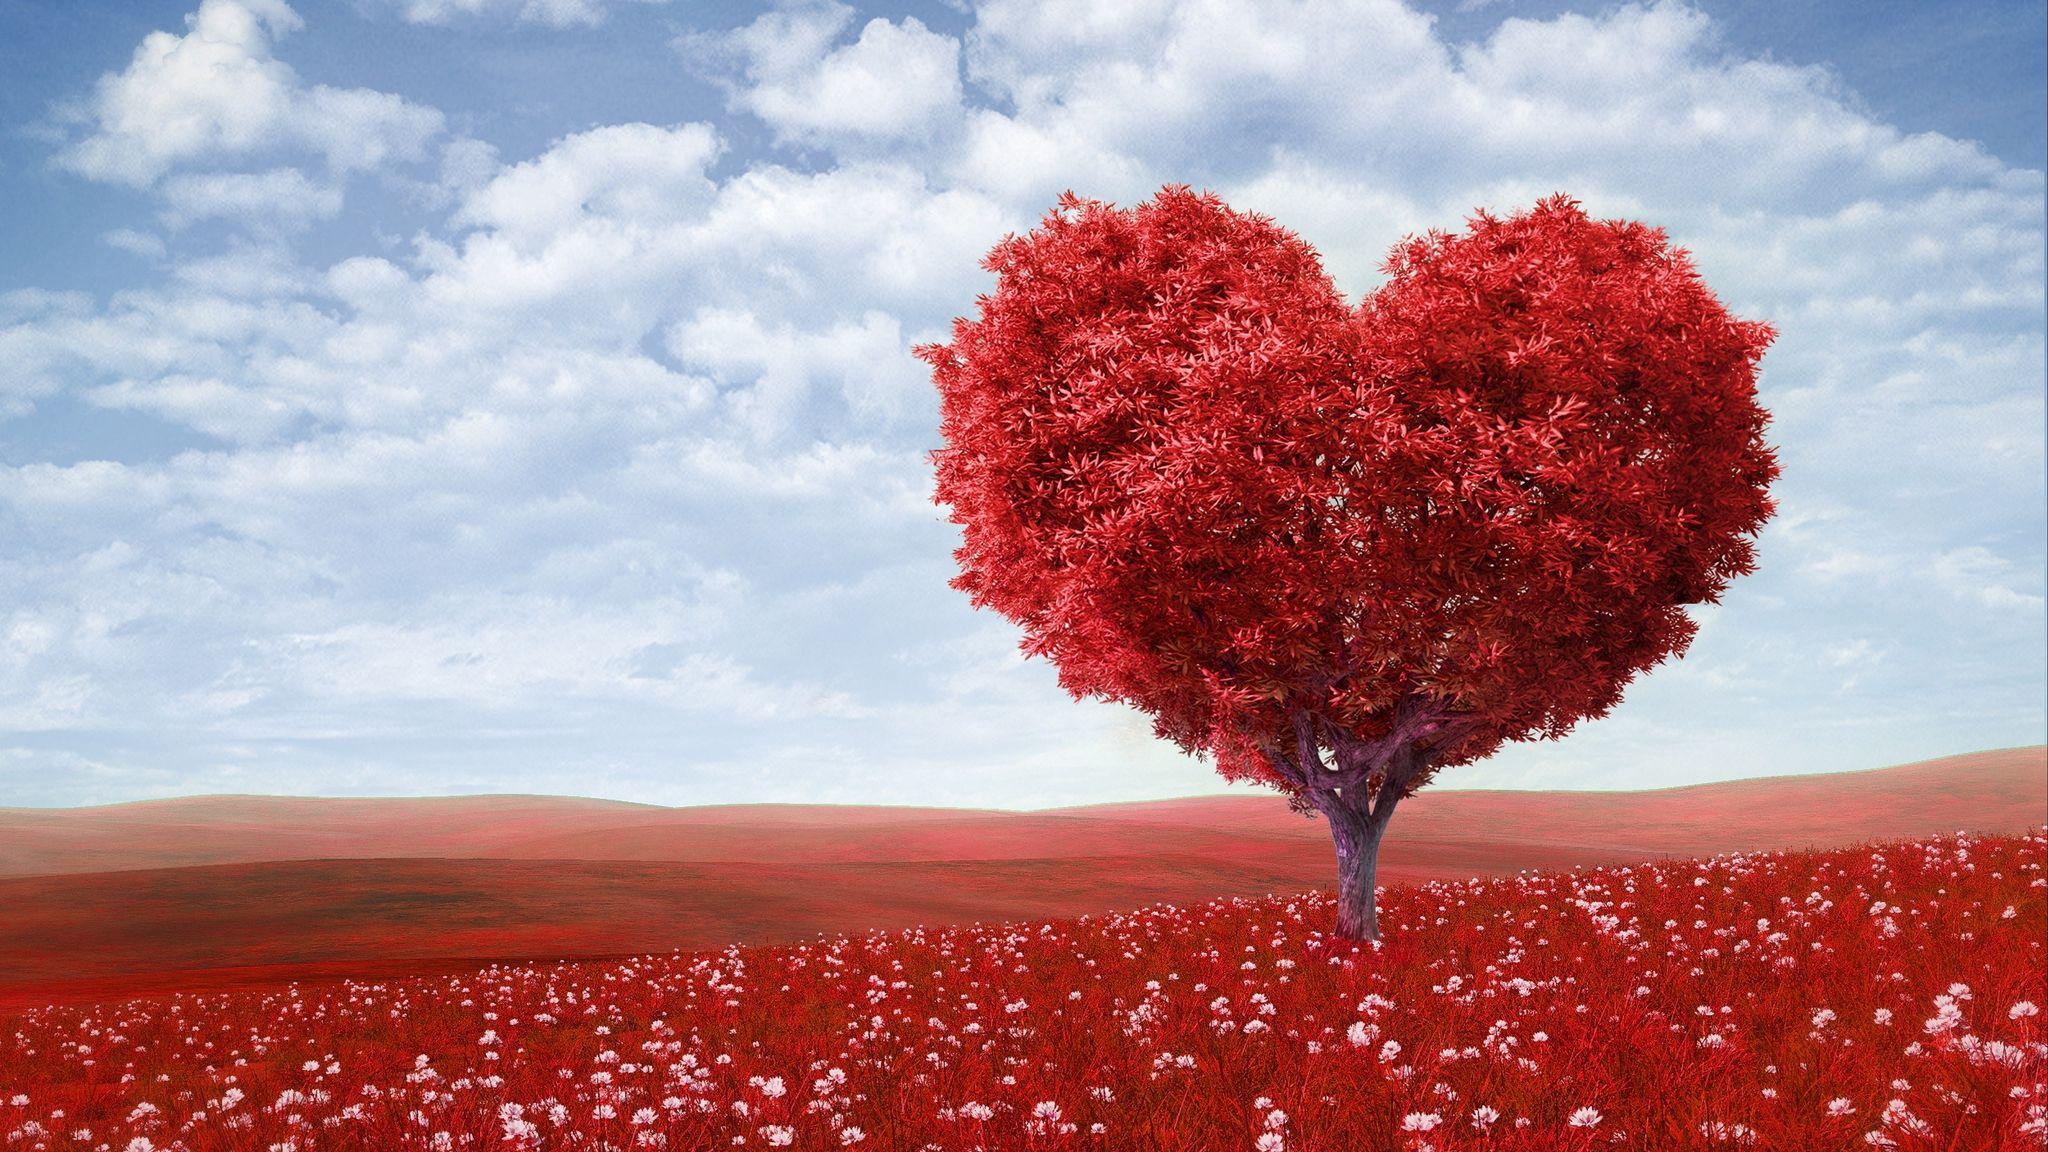 2048x1152 Wallpaper tree, heart, photoshop, field, grass, romance